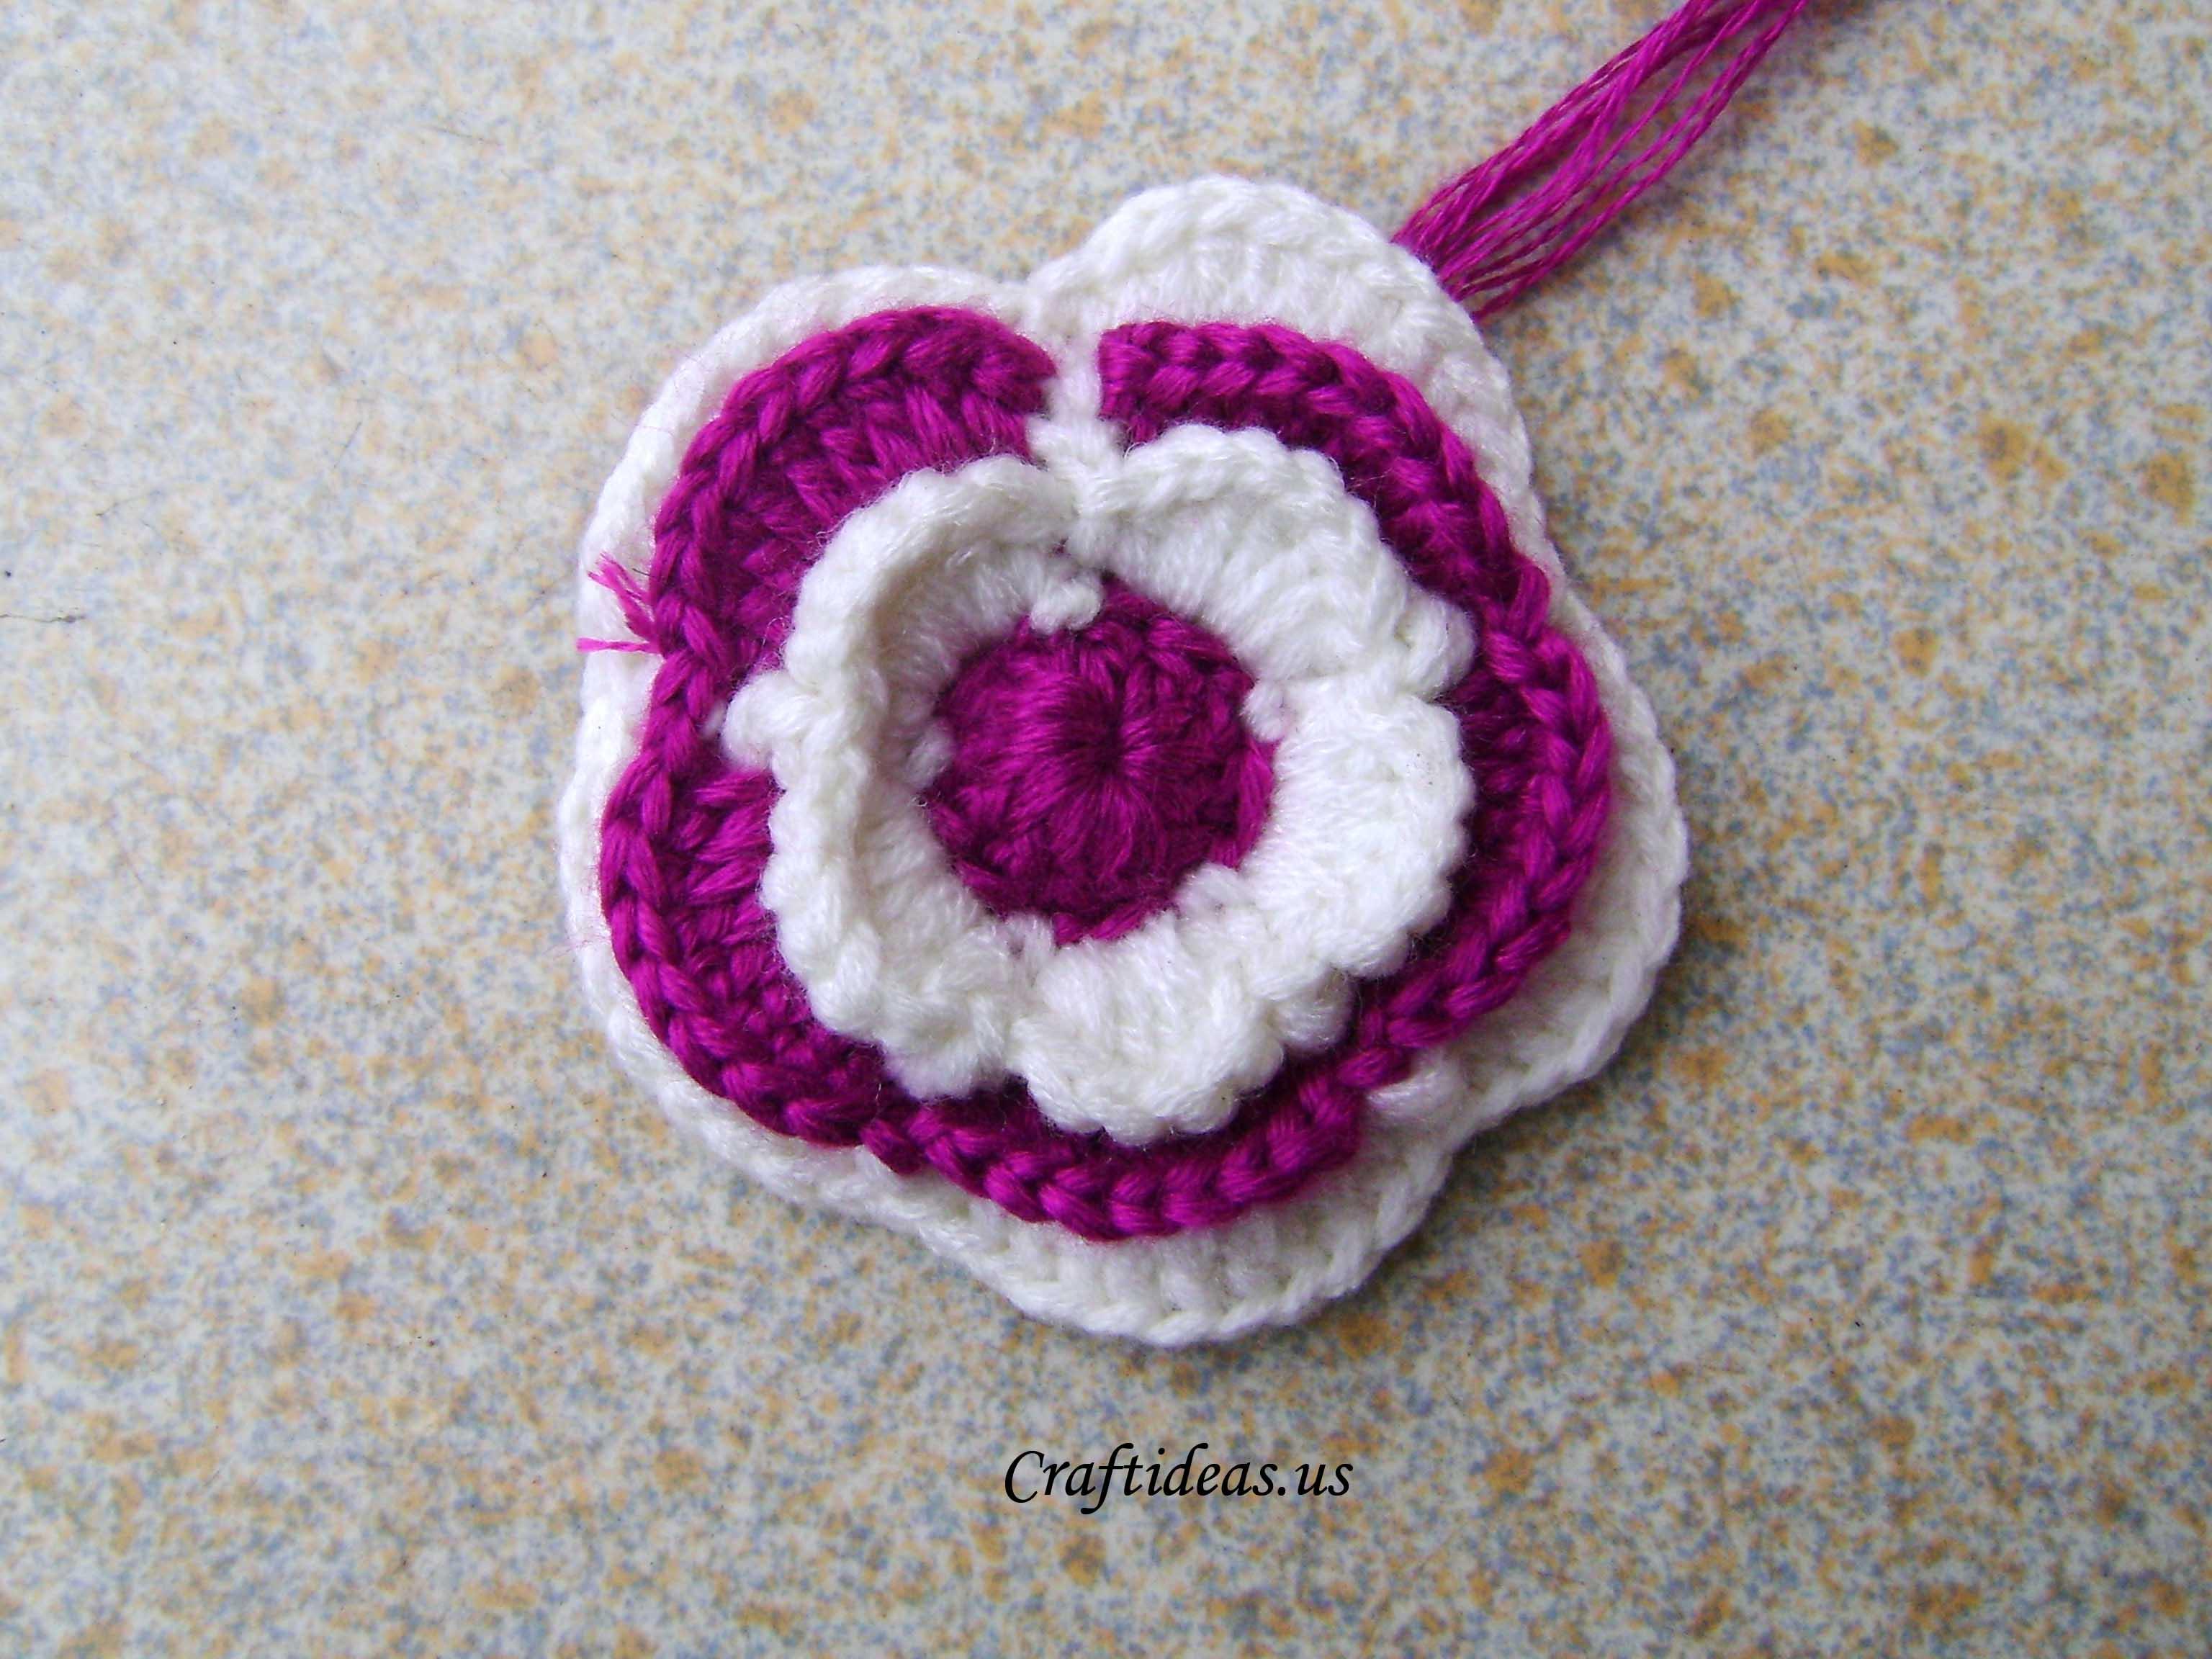 Crochet Crafts : Crochet spring flower - Craft Ideas